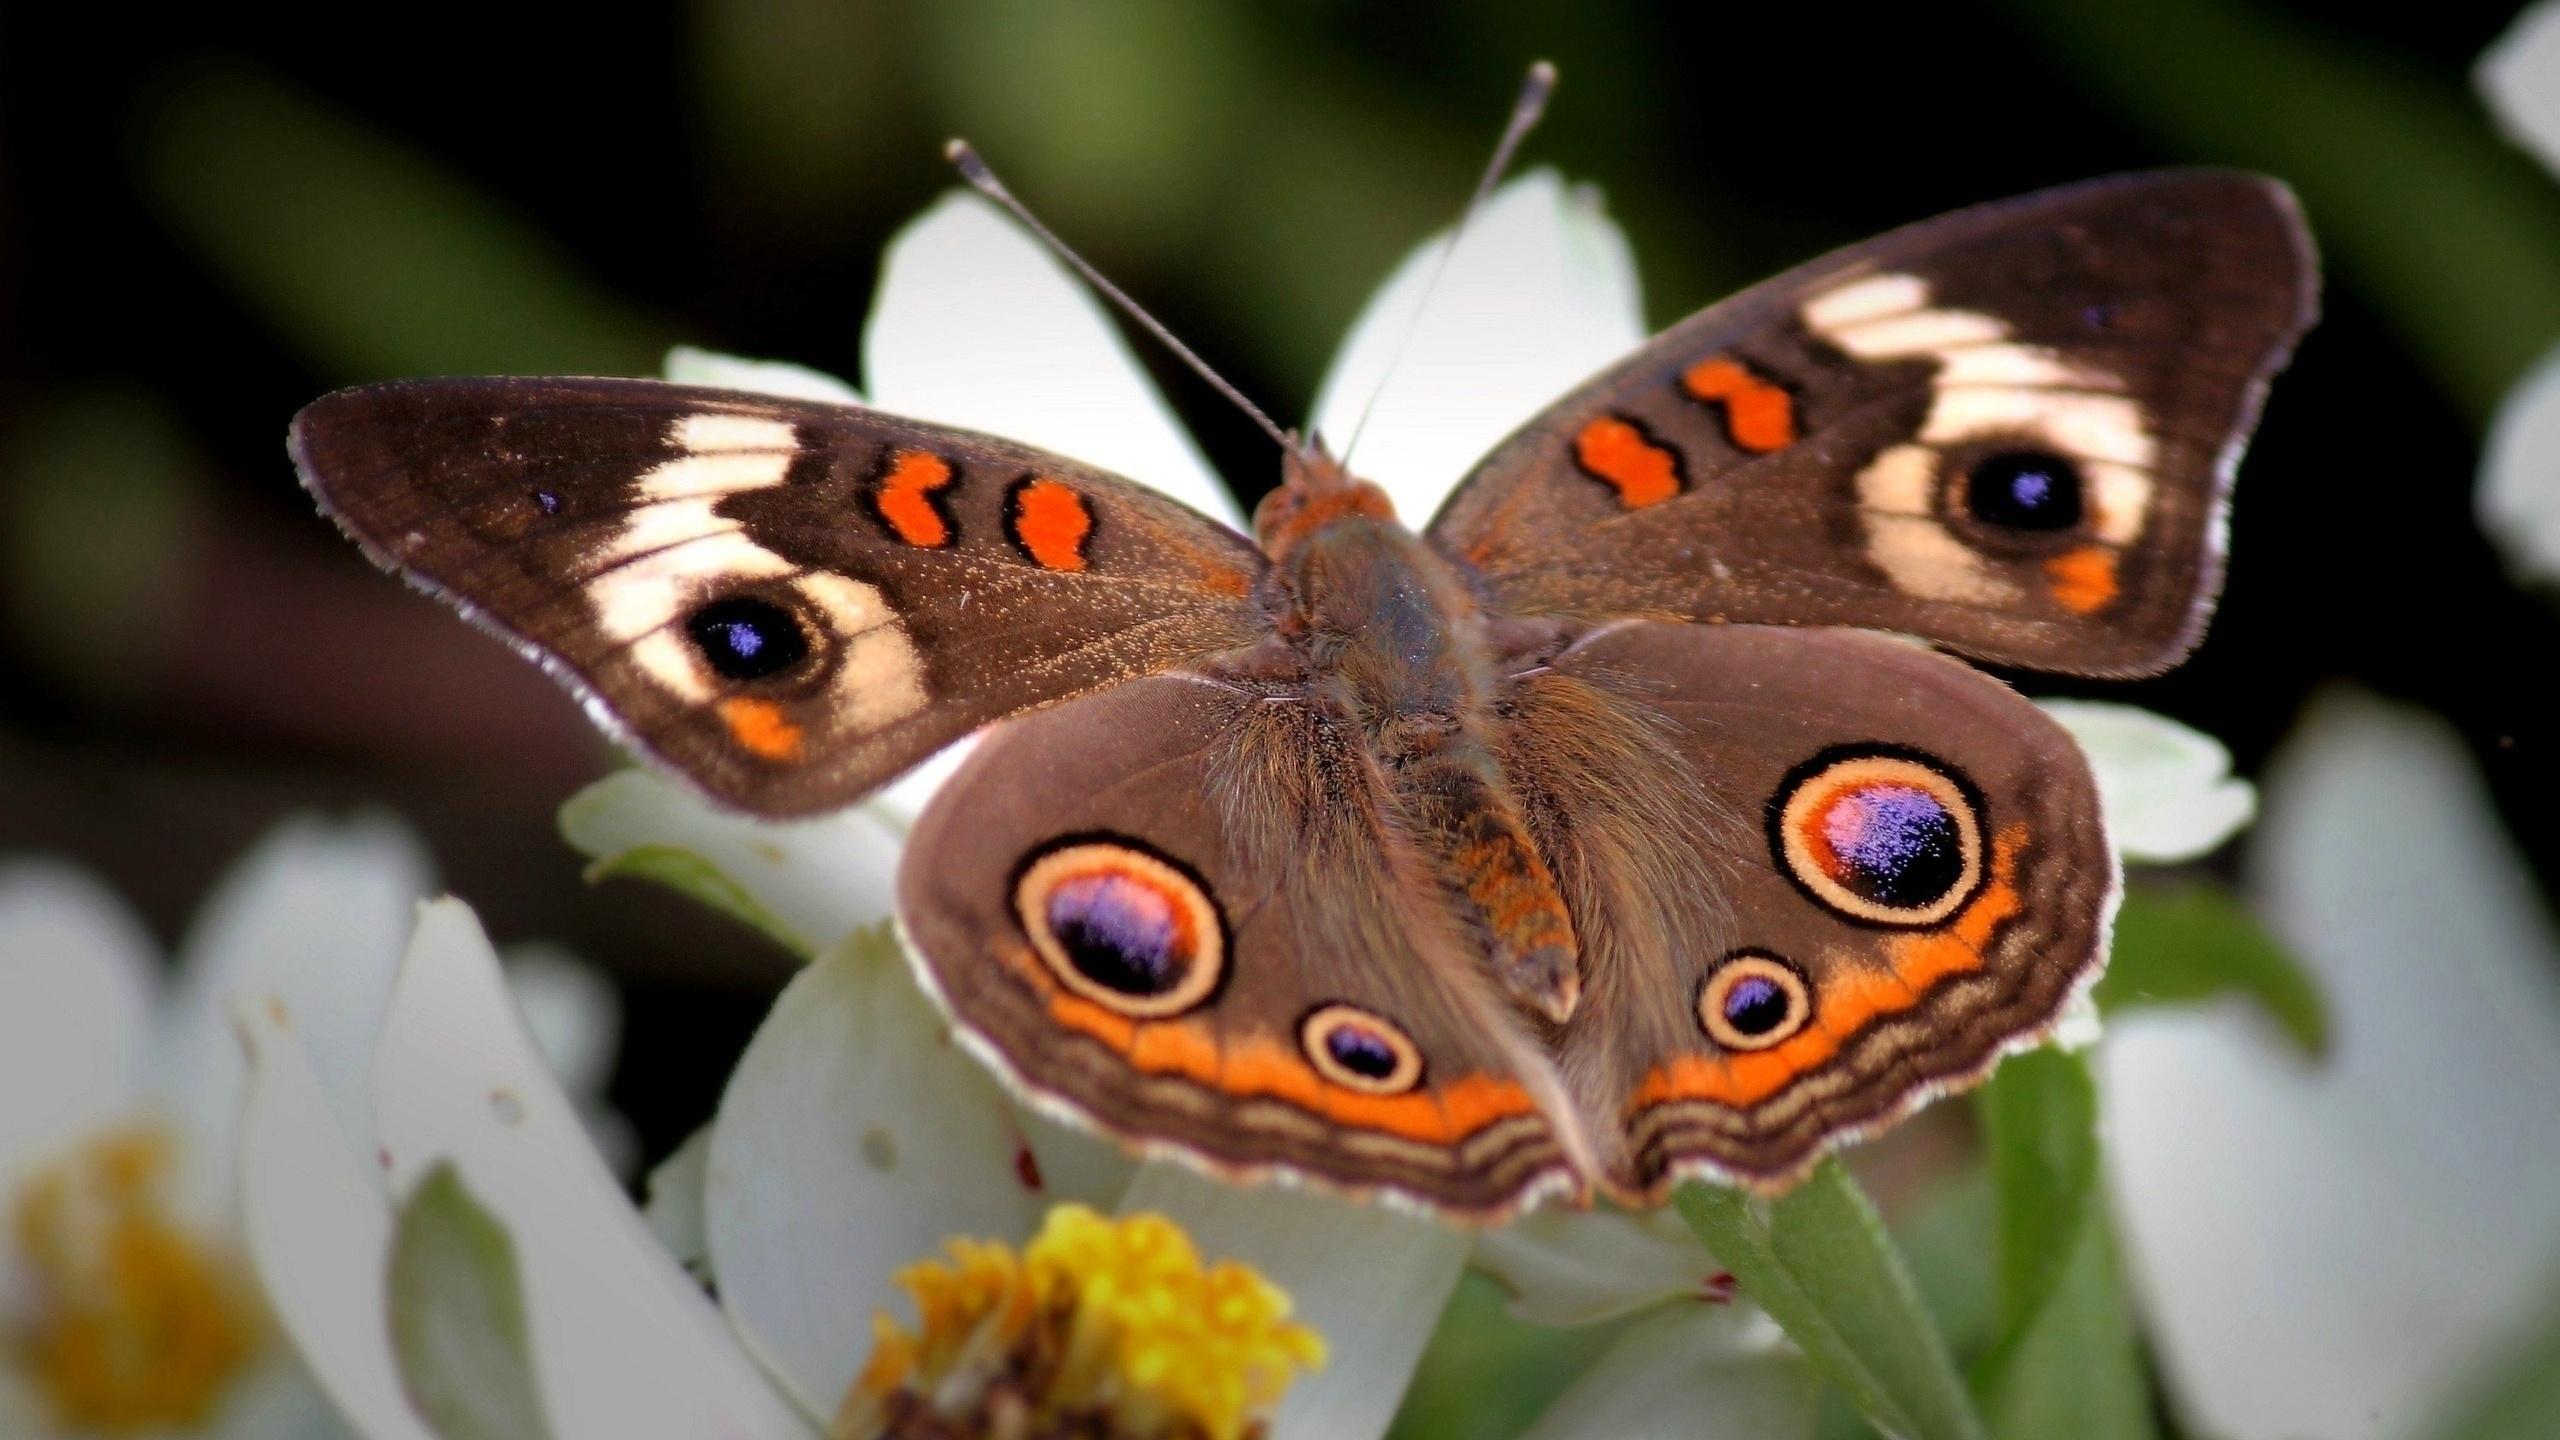 Картинка с бабочкой на цветке, богатыря